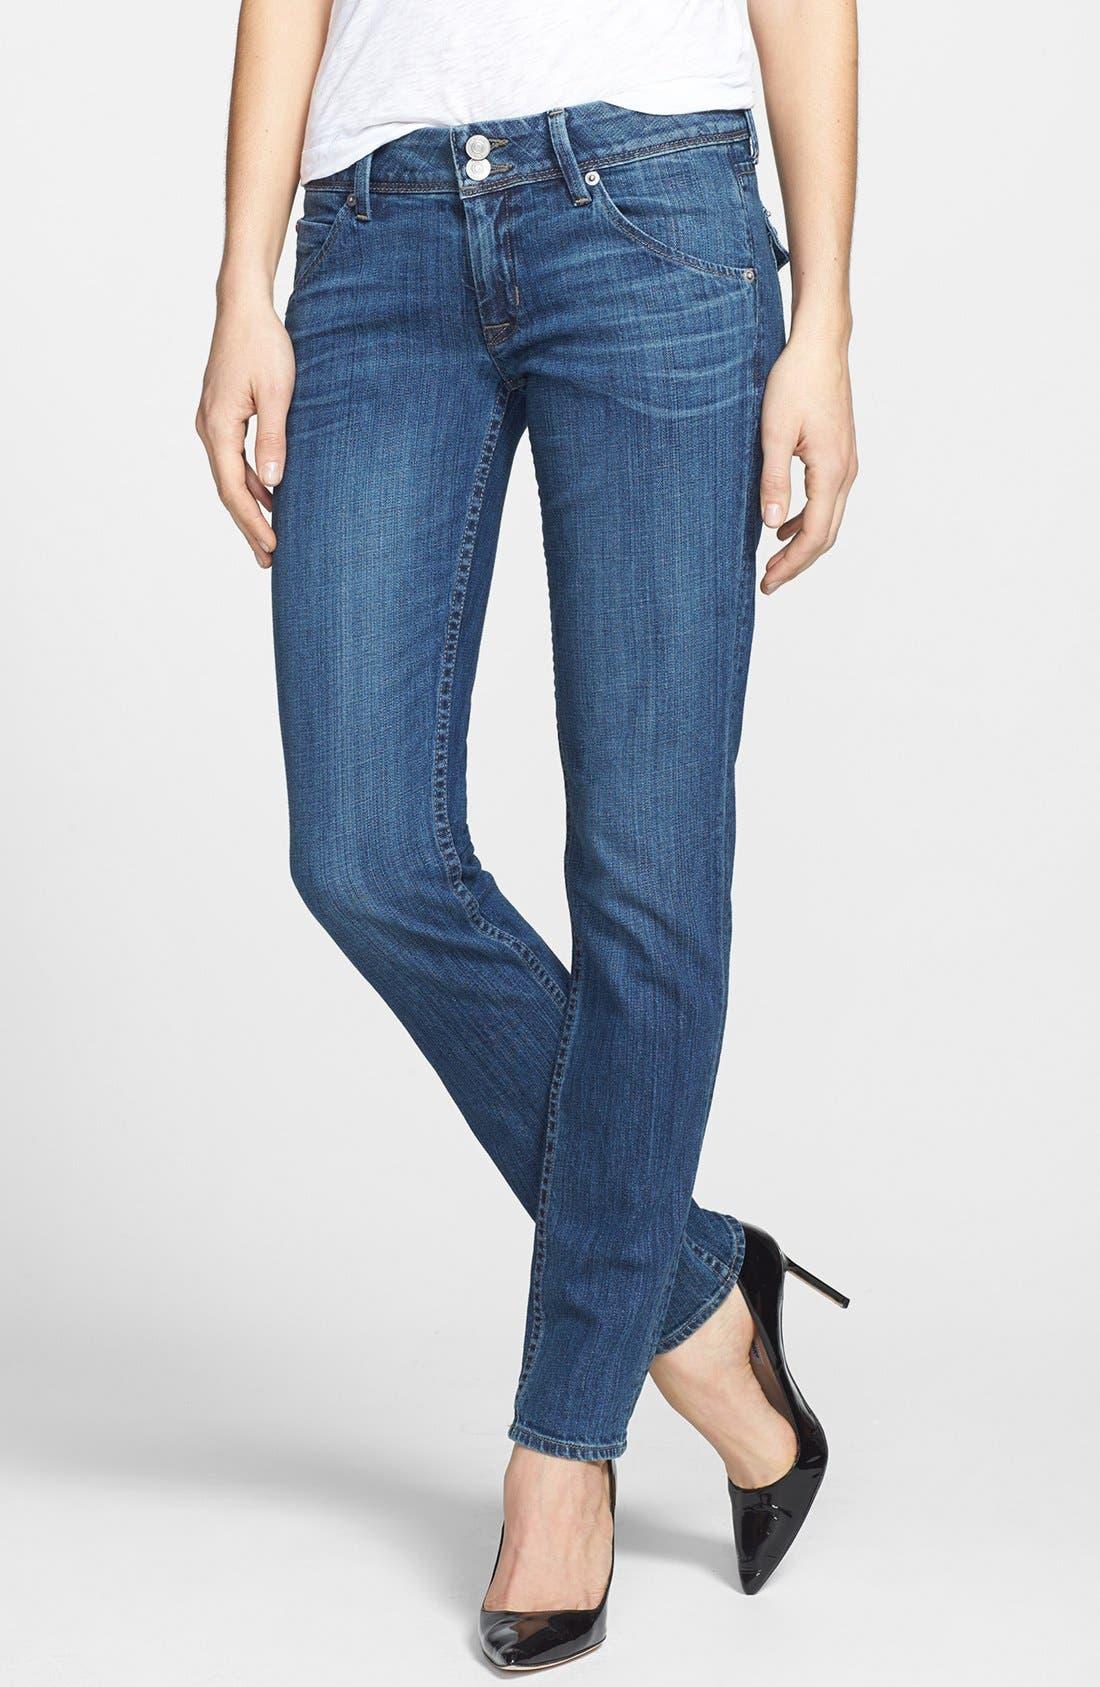 Alternate Image 1 Selected - Hudson Jeans 'Collin' Skinny Jeans (Prodigy)